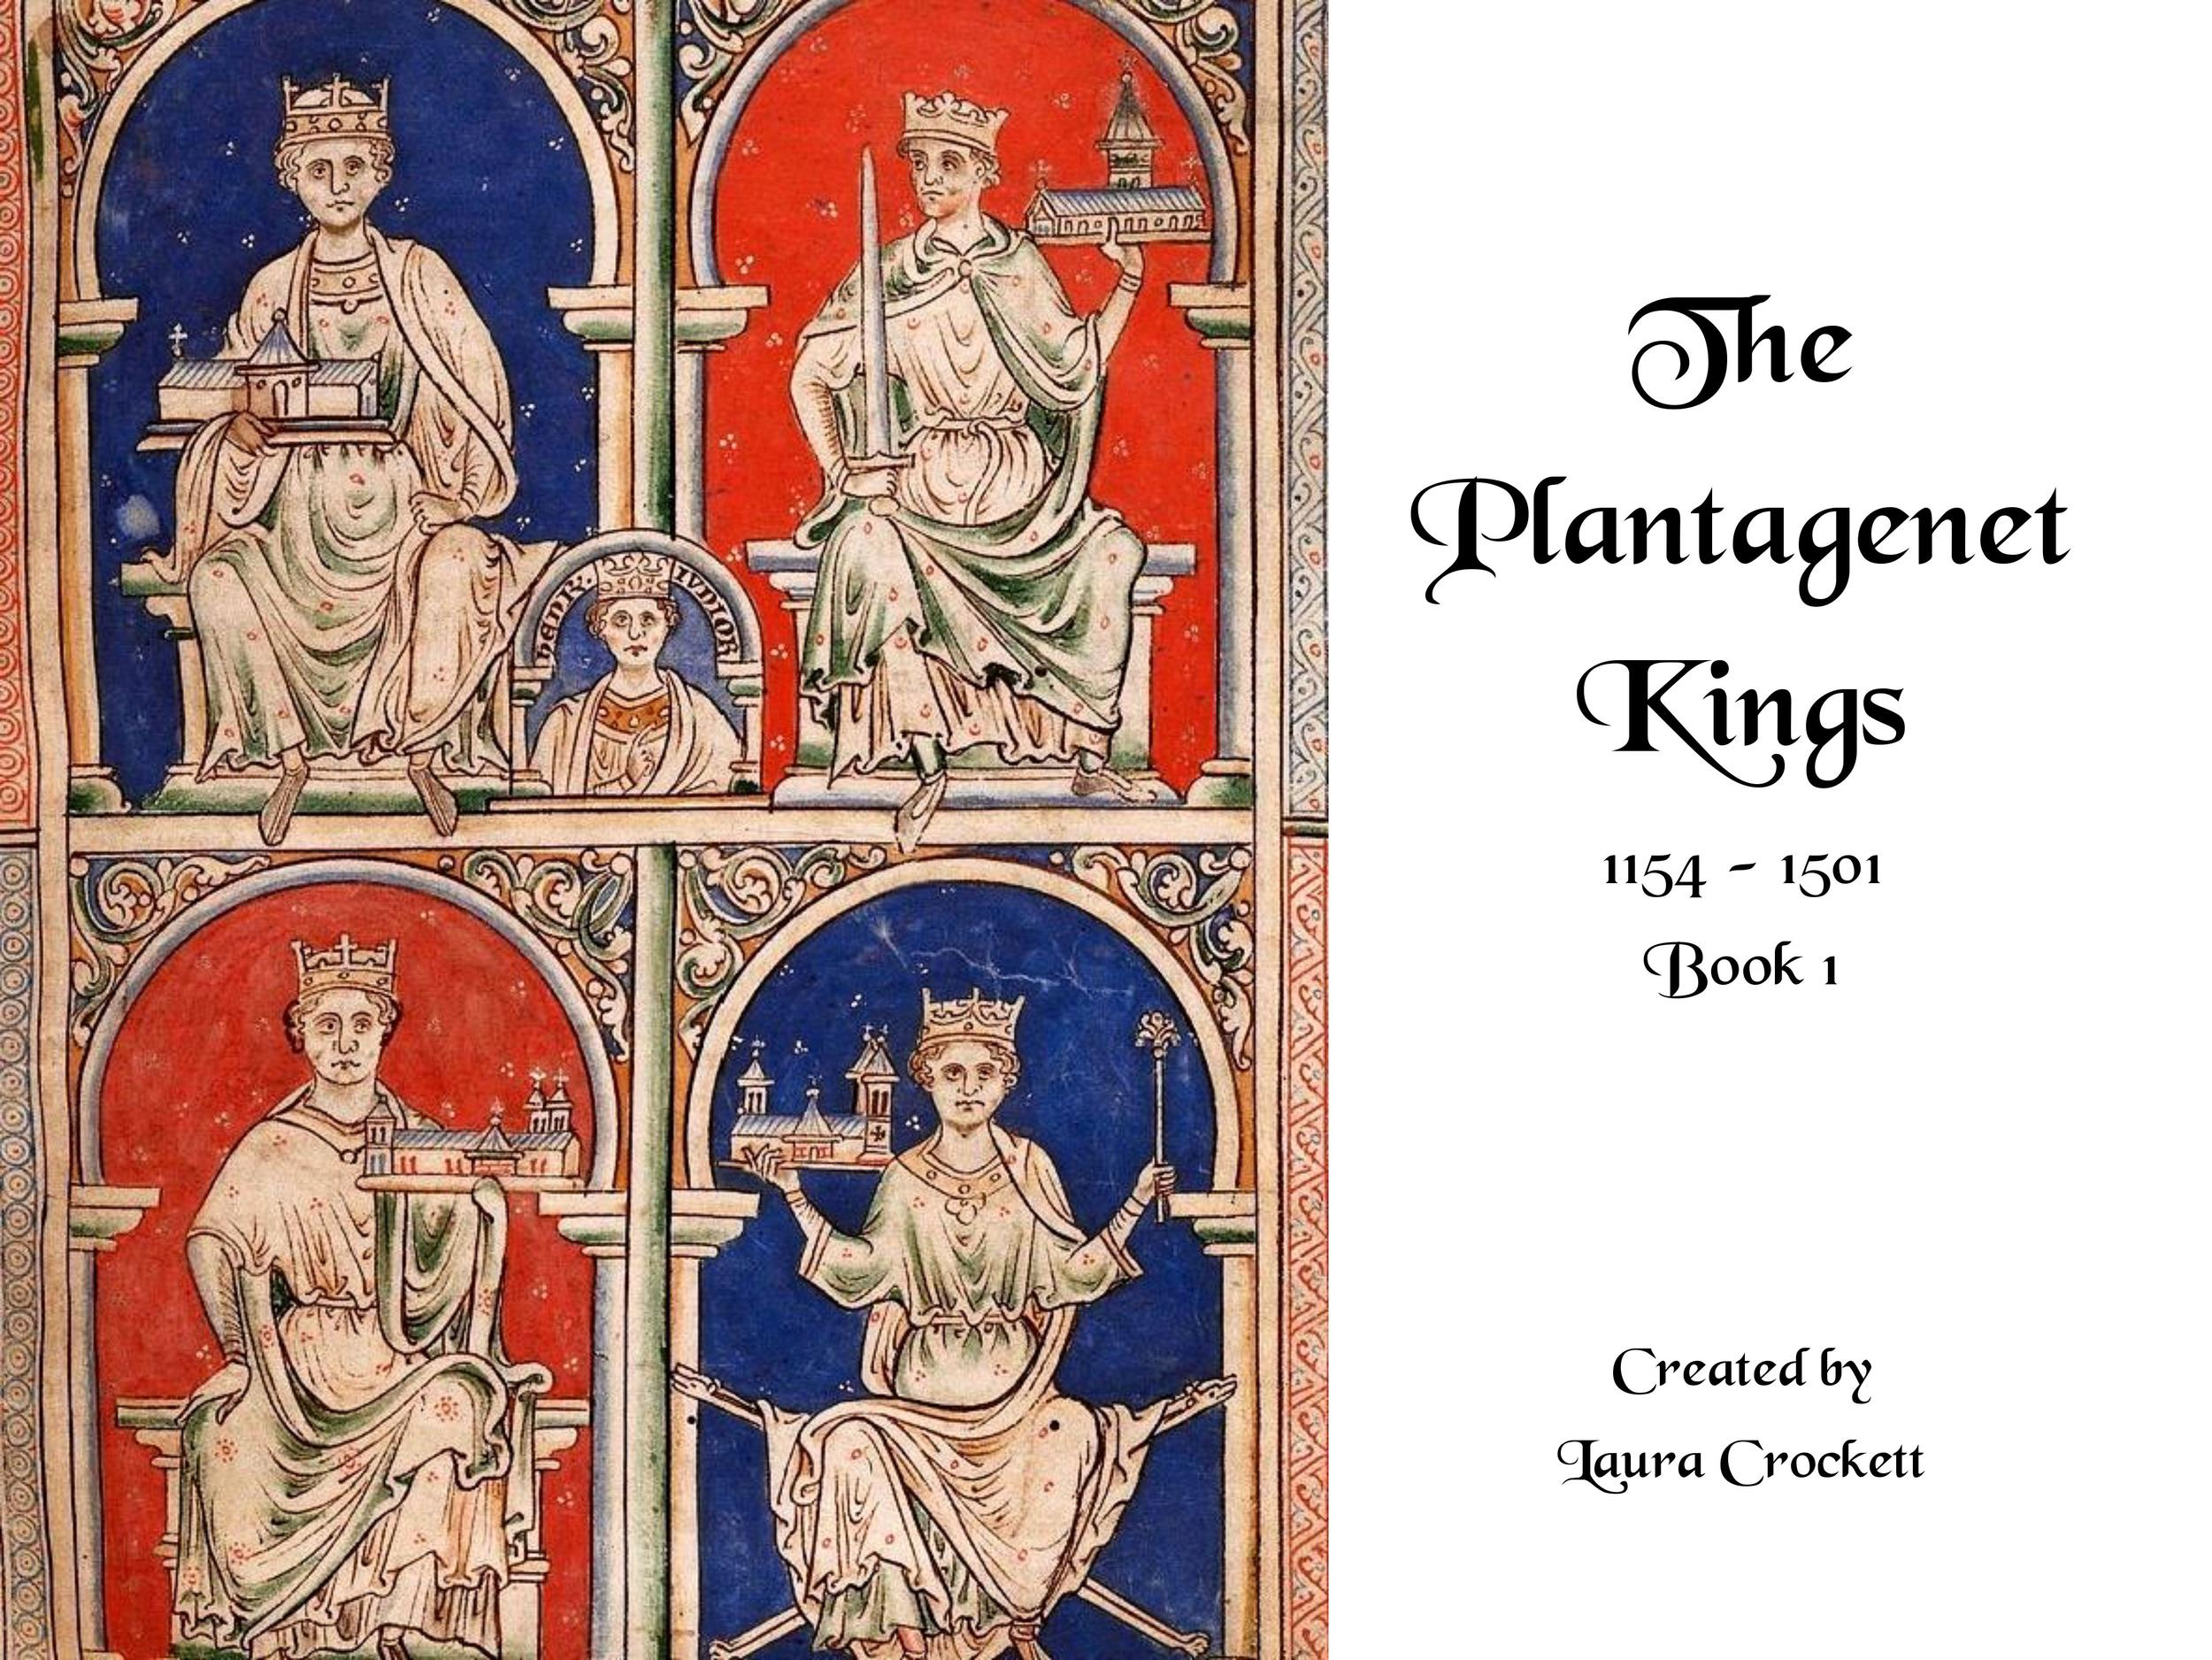 book of plantagenets, part 1-1.jpg